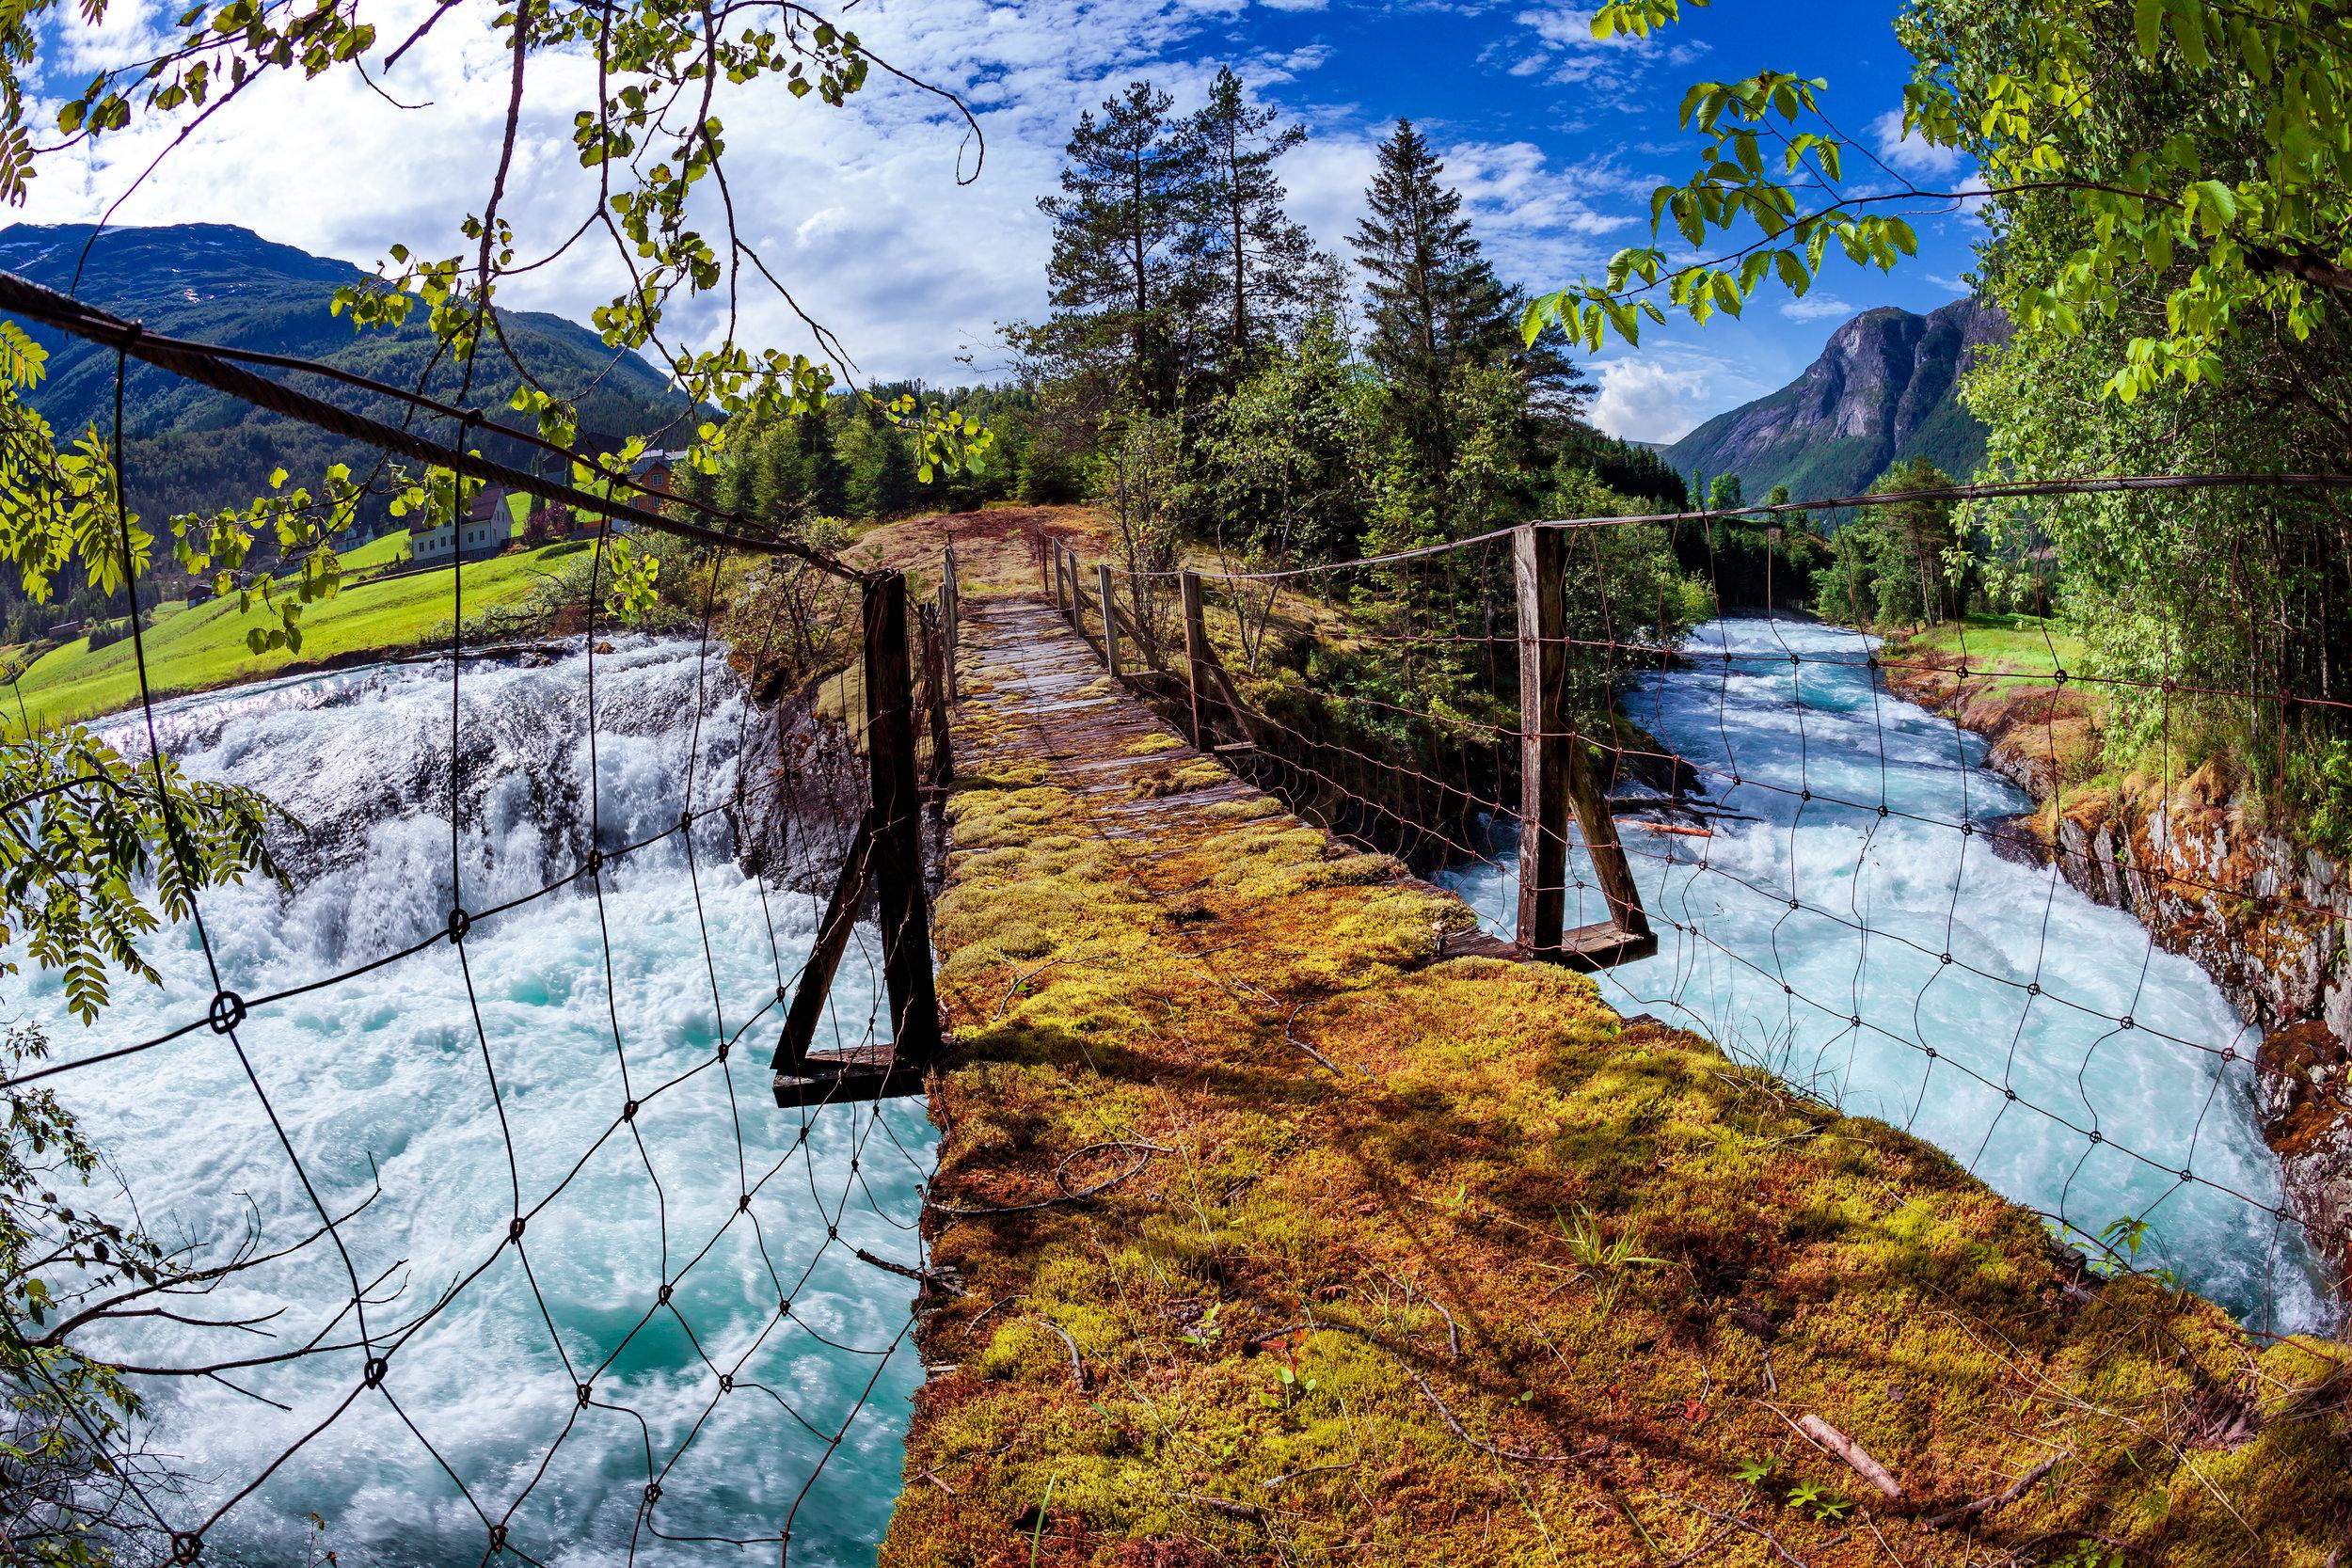 suspension-bridge-over-the-mountain-river-norway-P73JDMN.jpg